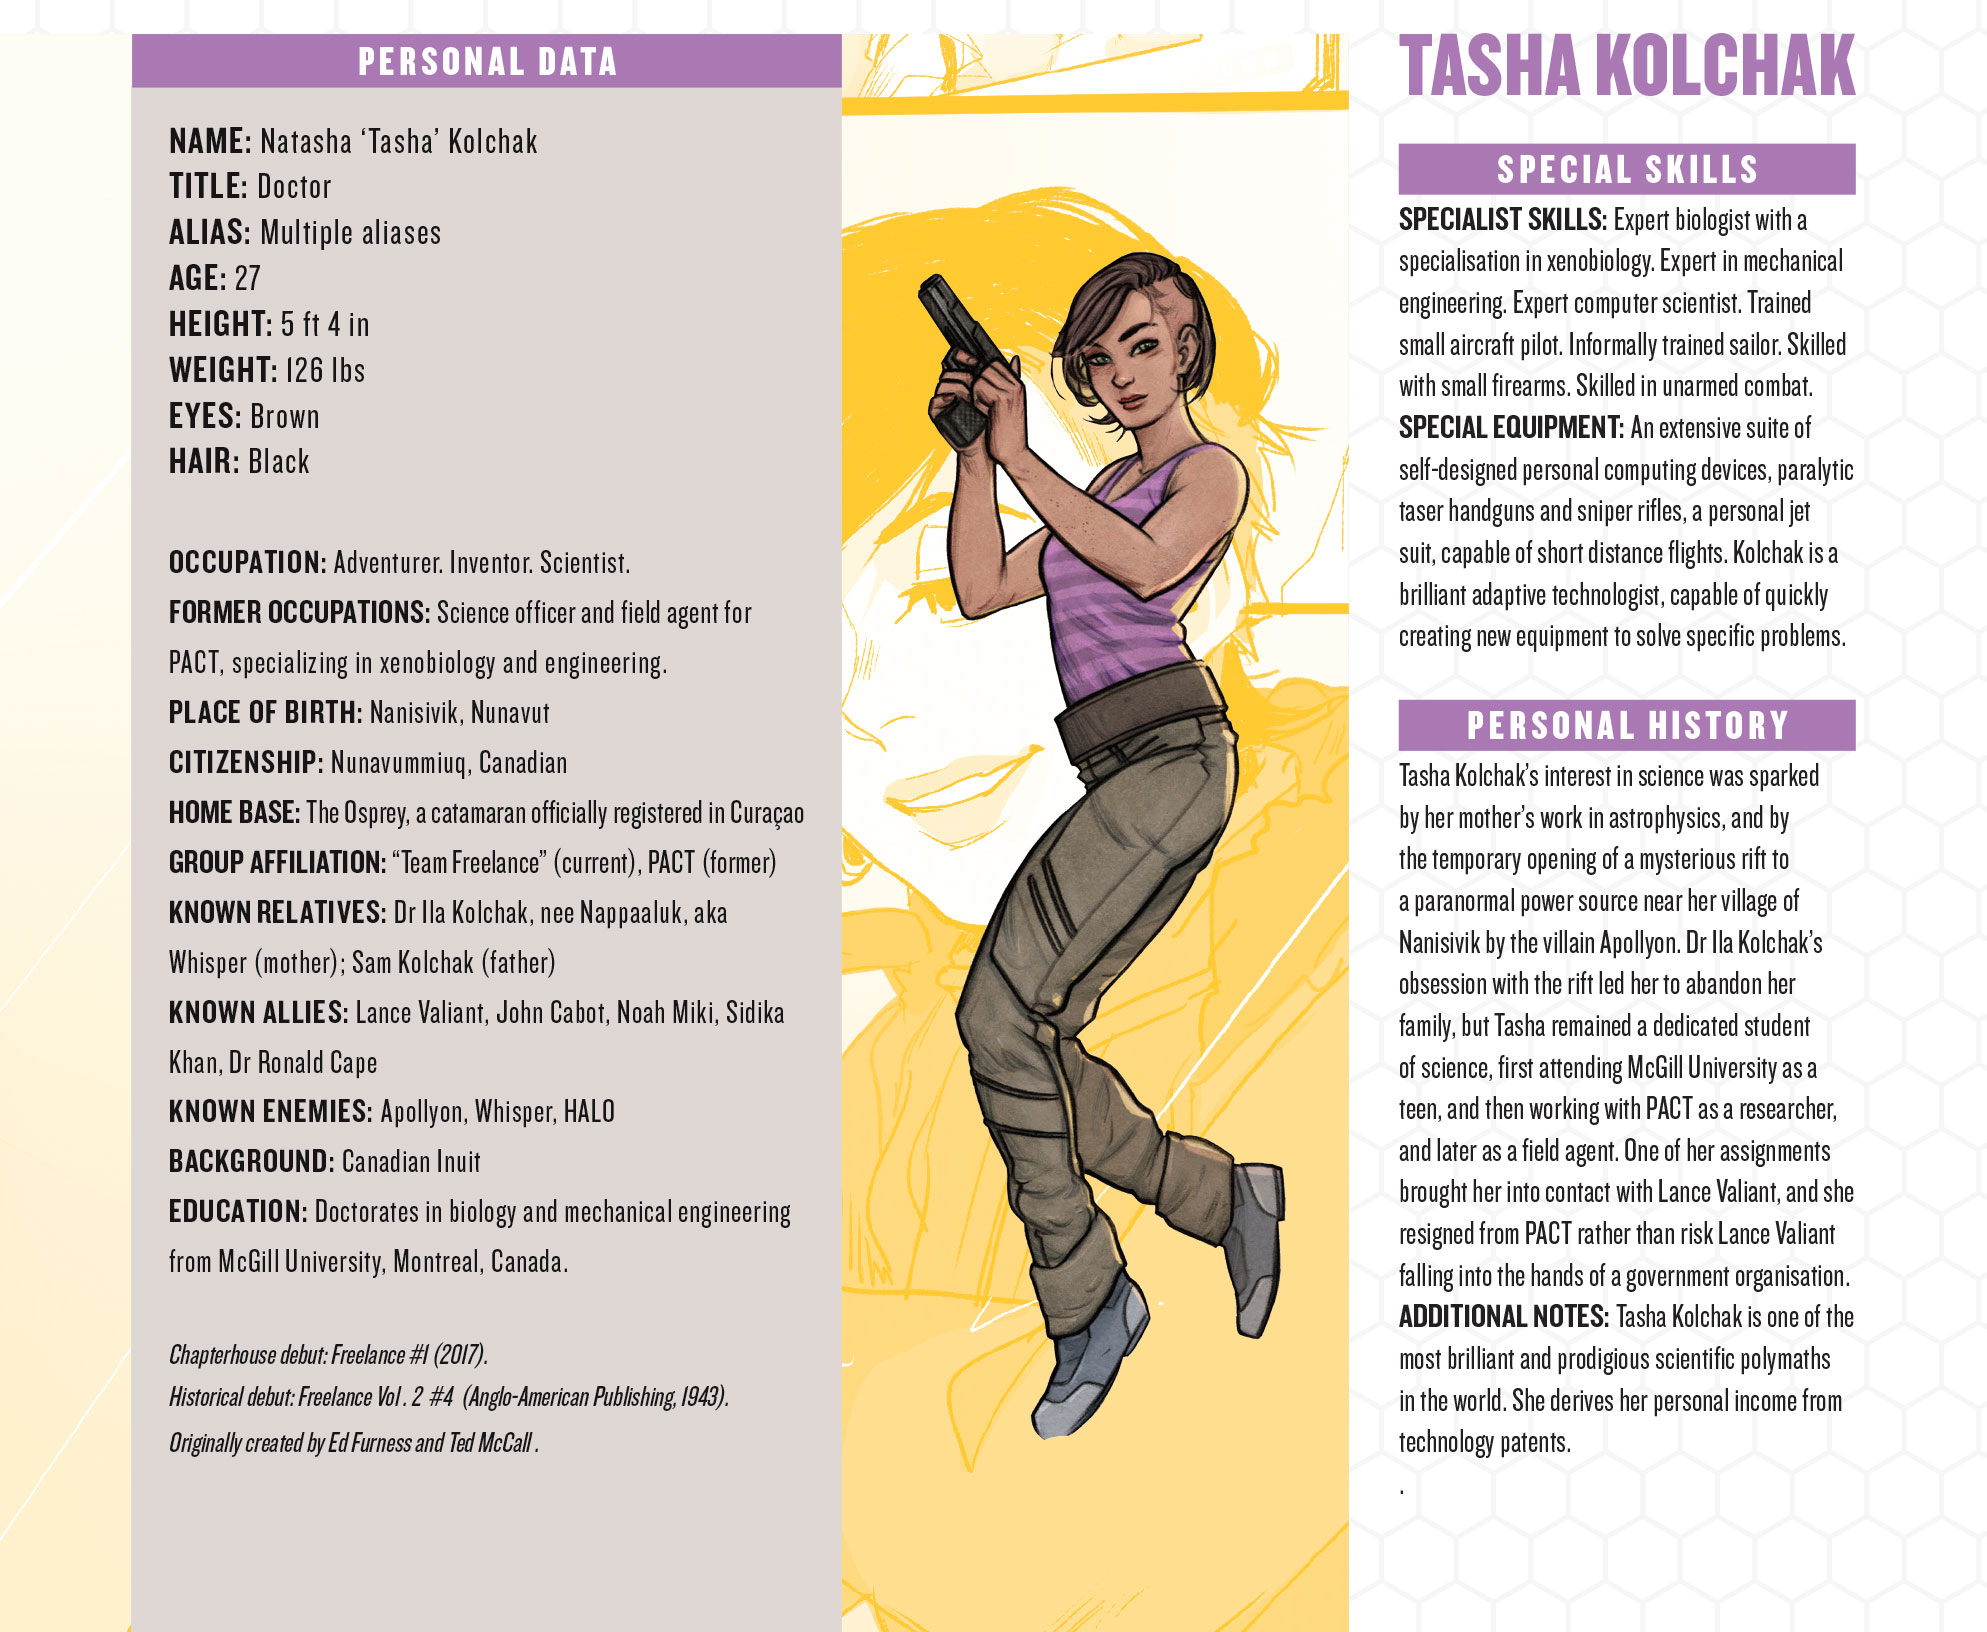 Chapterverse_character-bios_2018-TashaK.jpg